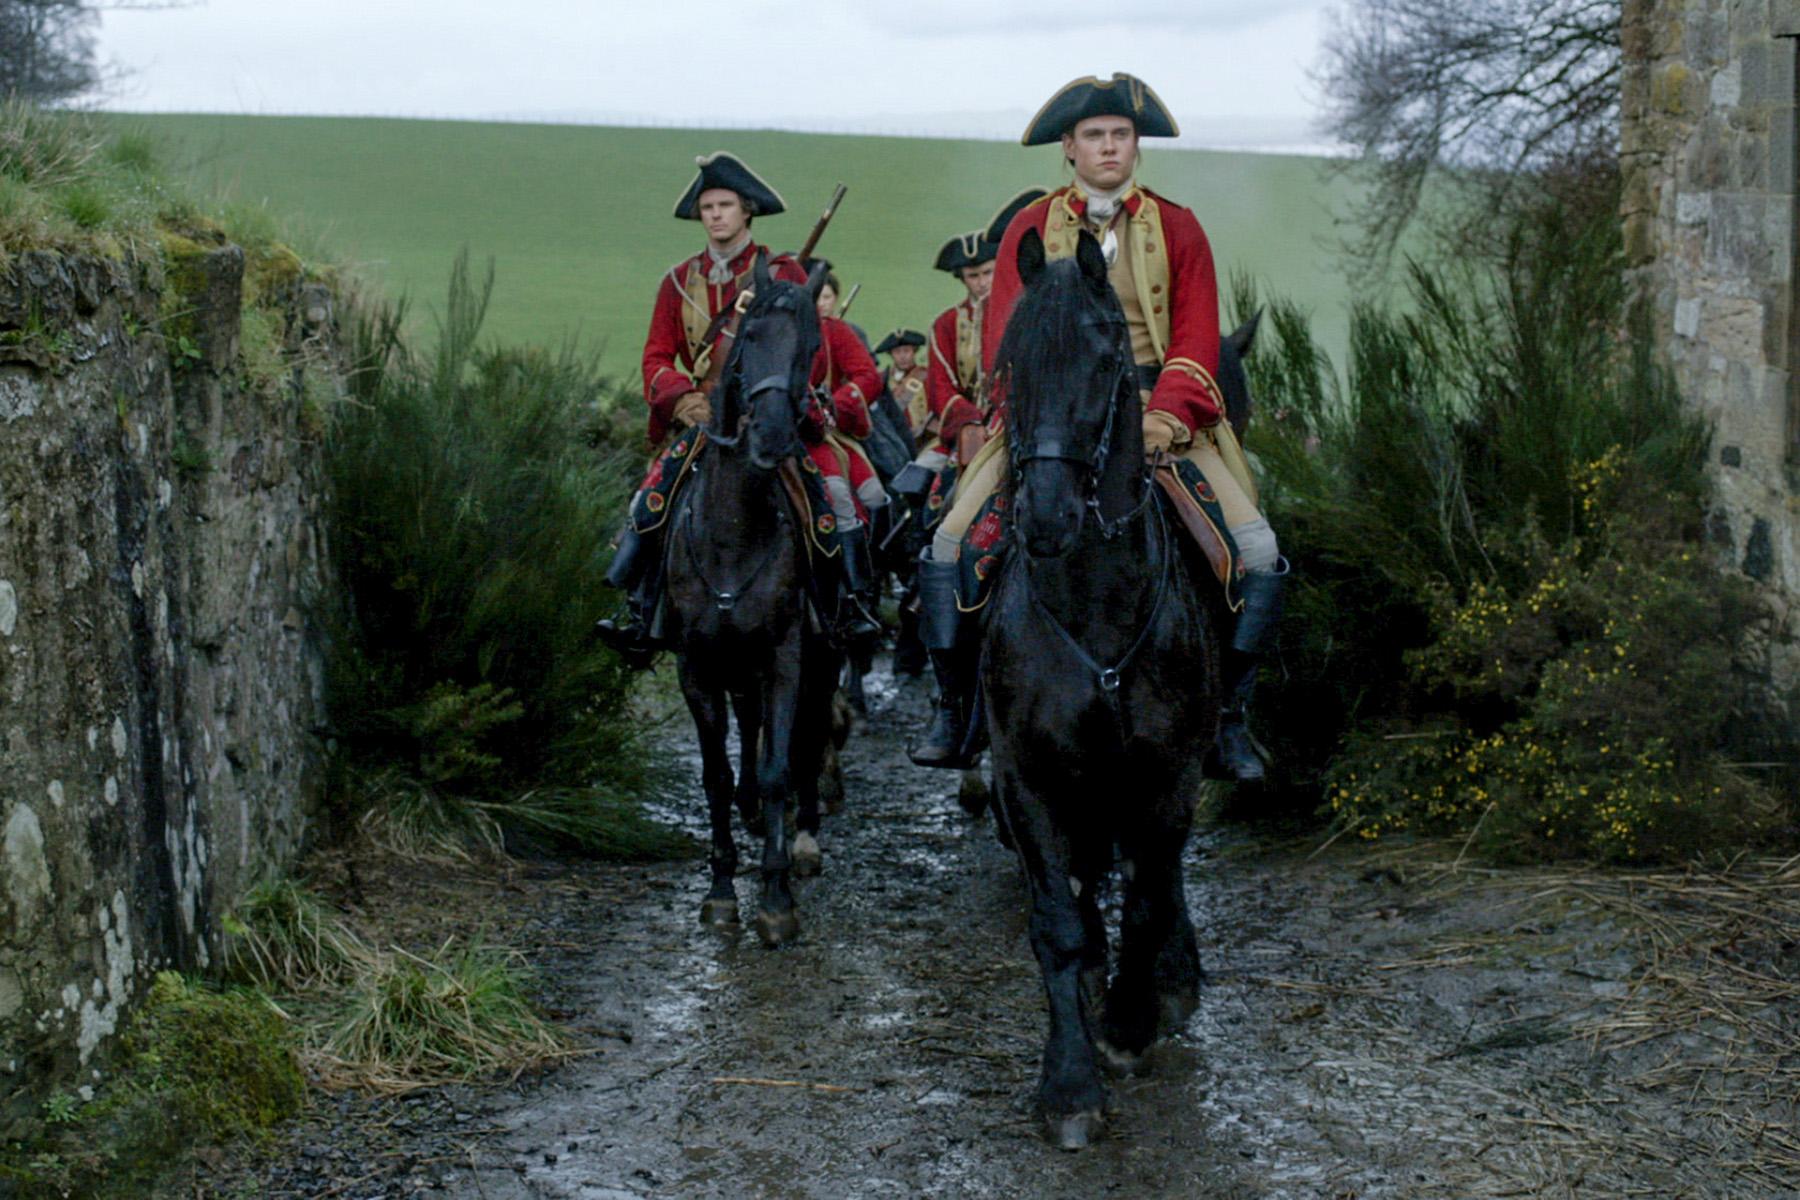 Tom-Brittney-as-Lieutenant-Jeremy-Foster-in-'Outlander'-Episode-6-'The-Garrison-Commander